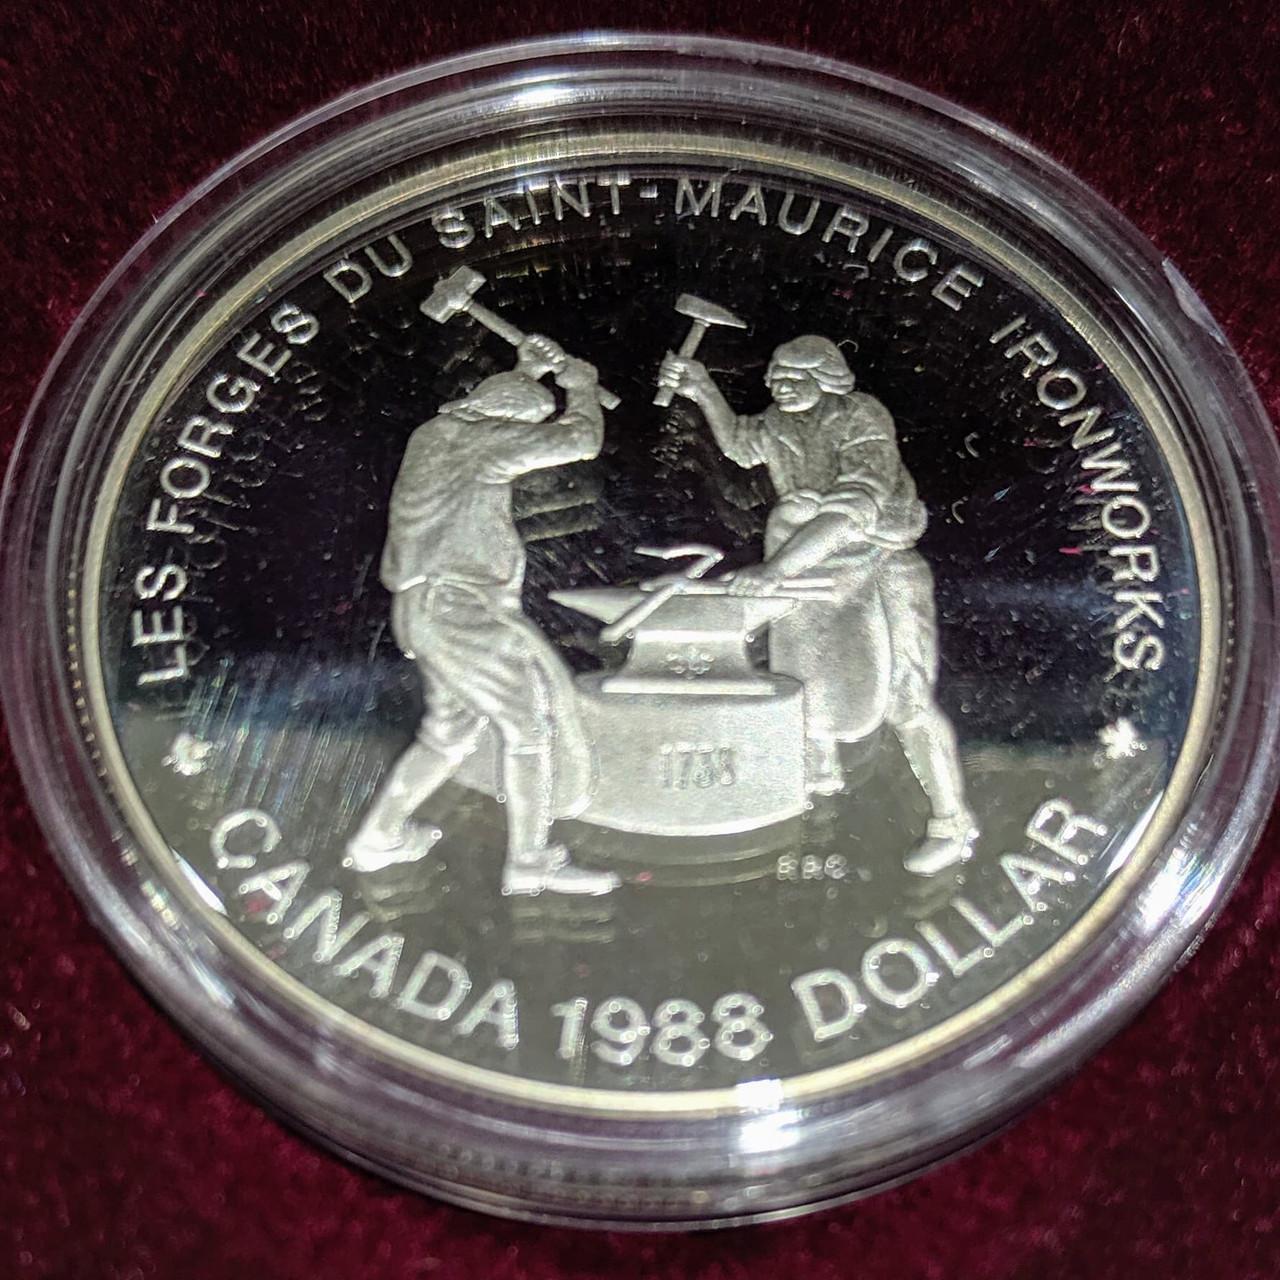 Canadian Pacific Railway Centennial 1981 CANADA UNC PROOF SILVER DOLLAR